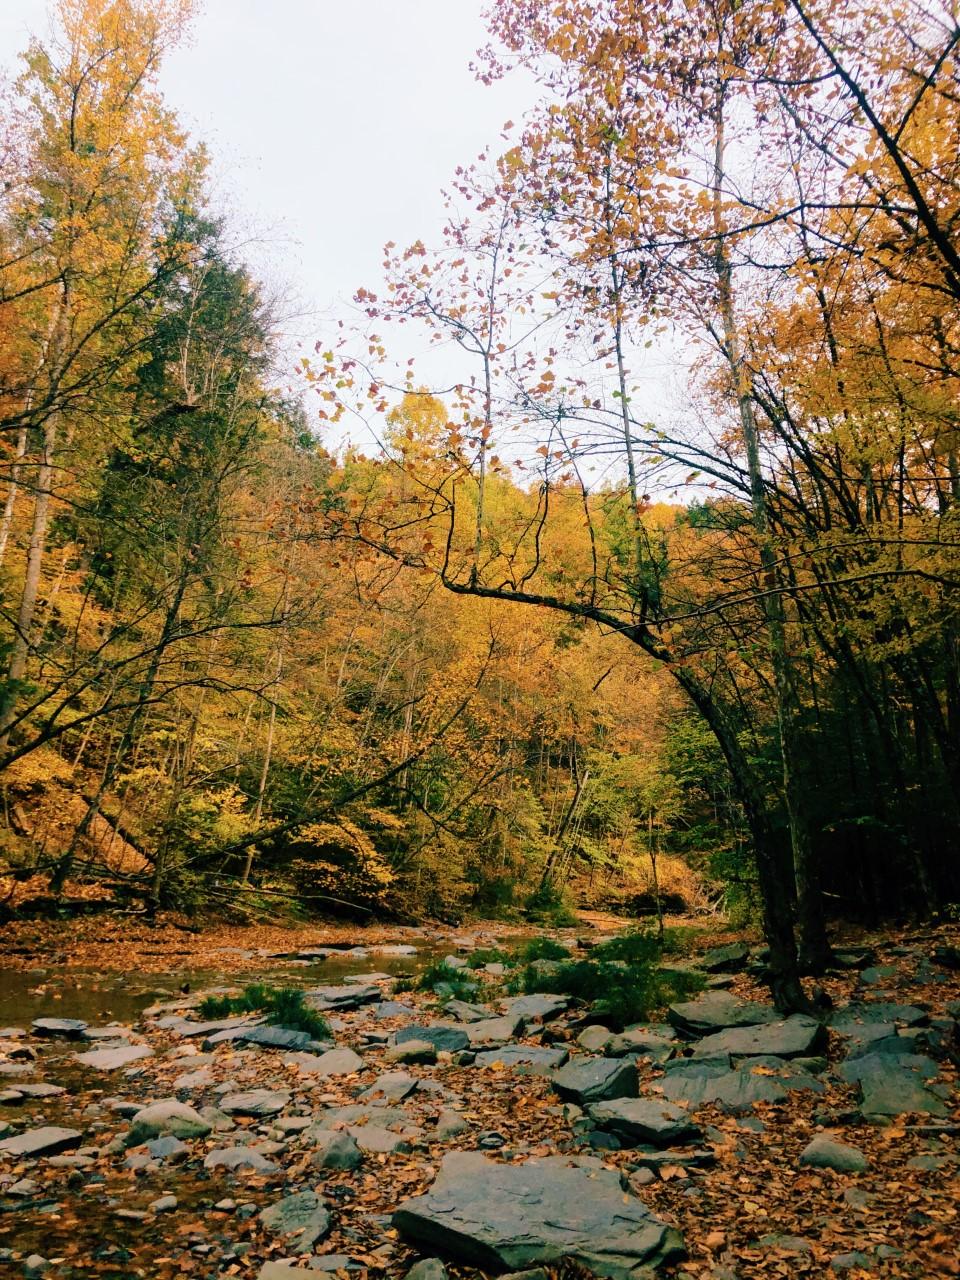 Hiking at Robert H. Treman State Park | Organized Mess